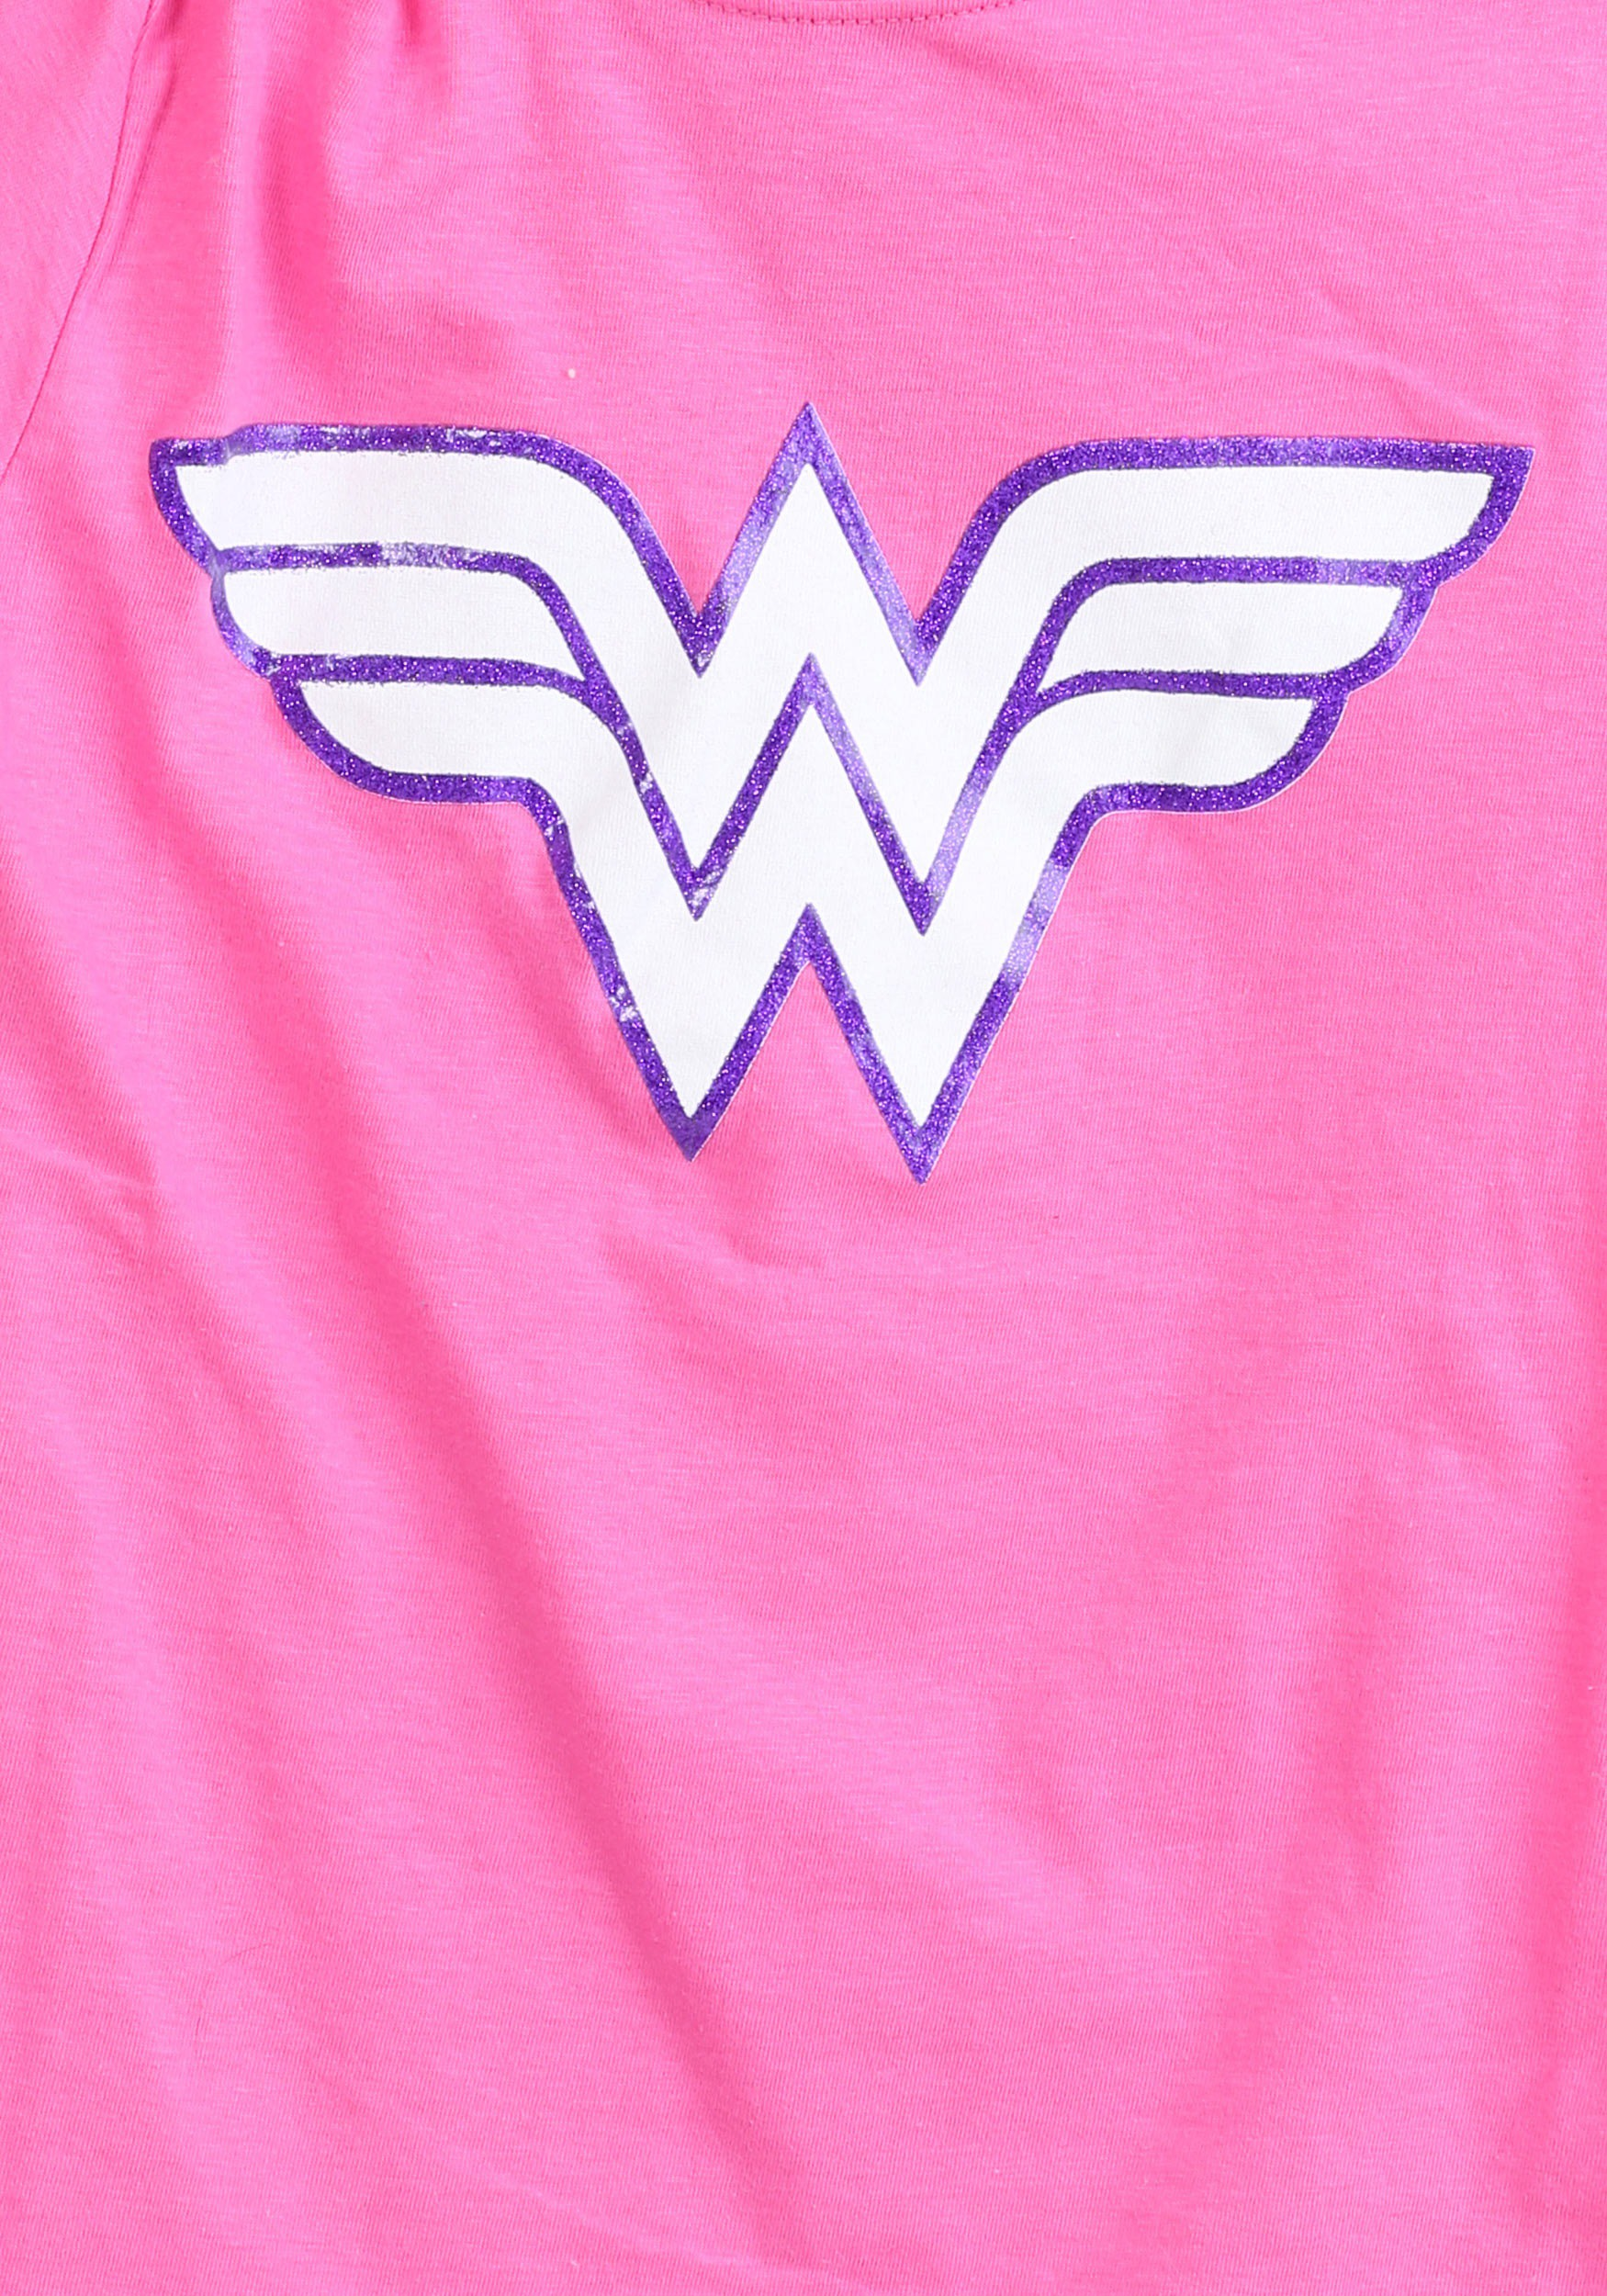 Women Superhero Shirt